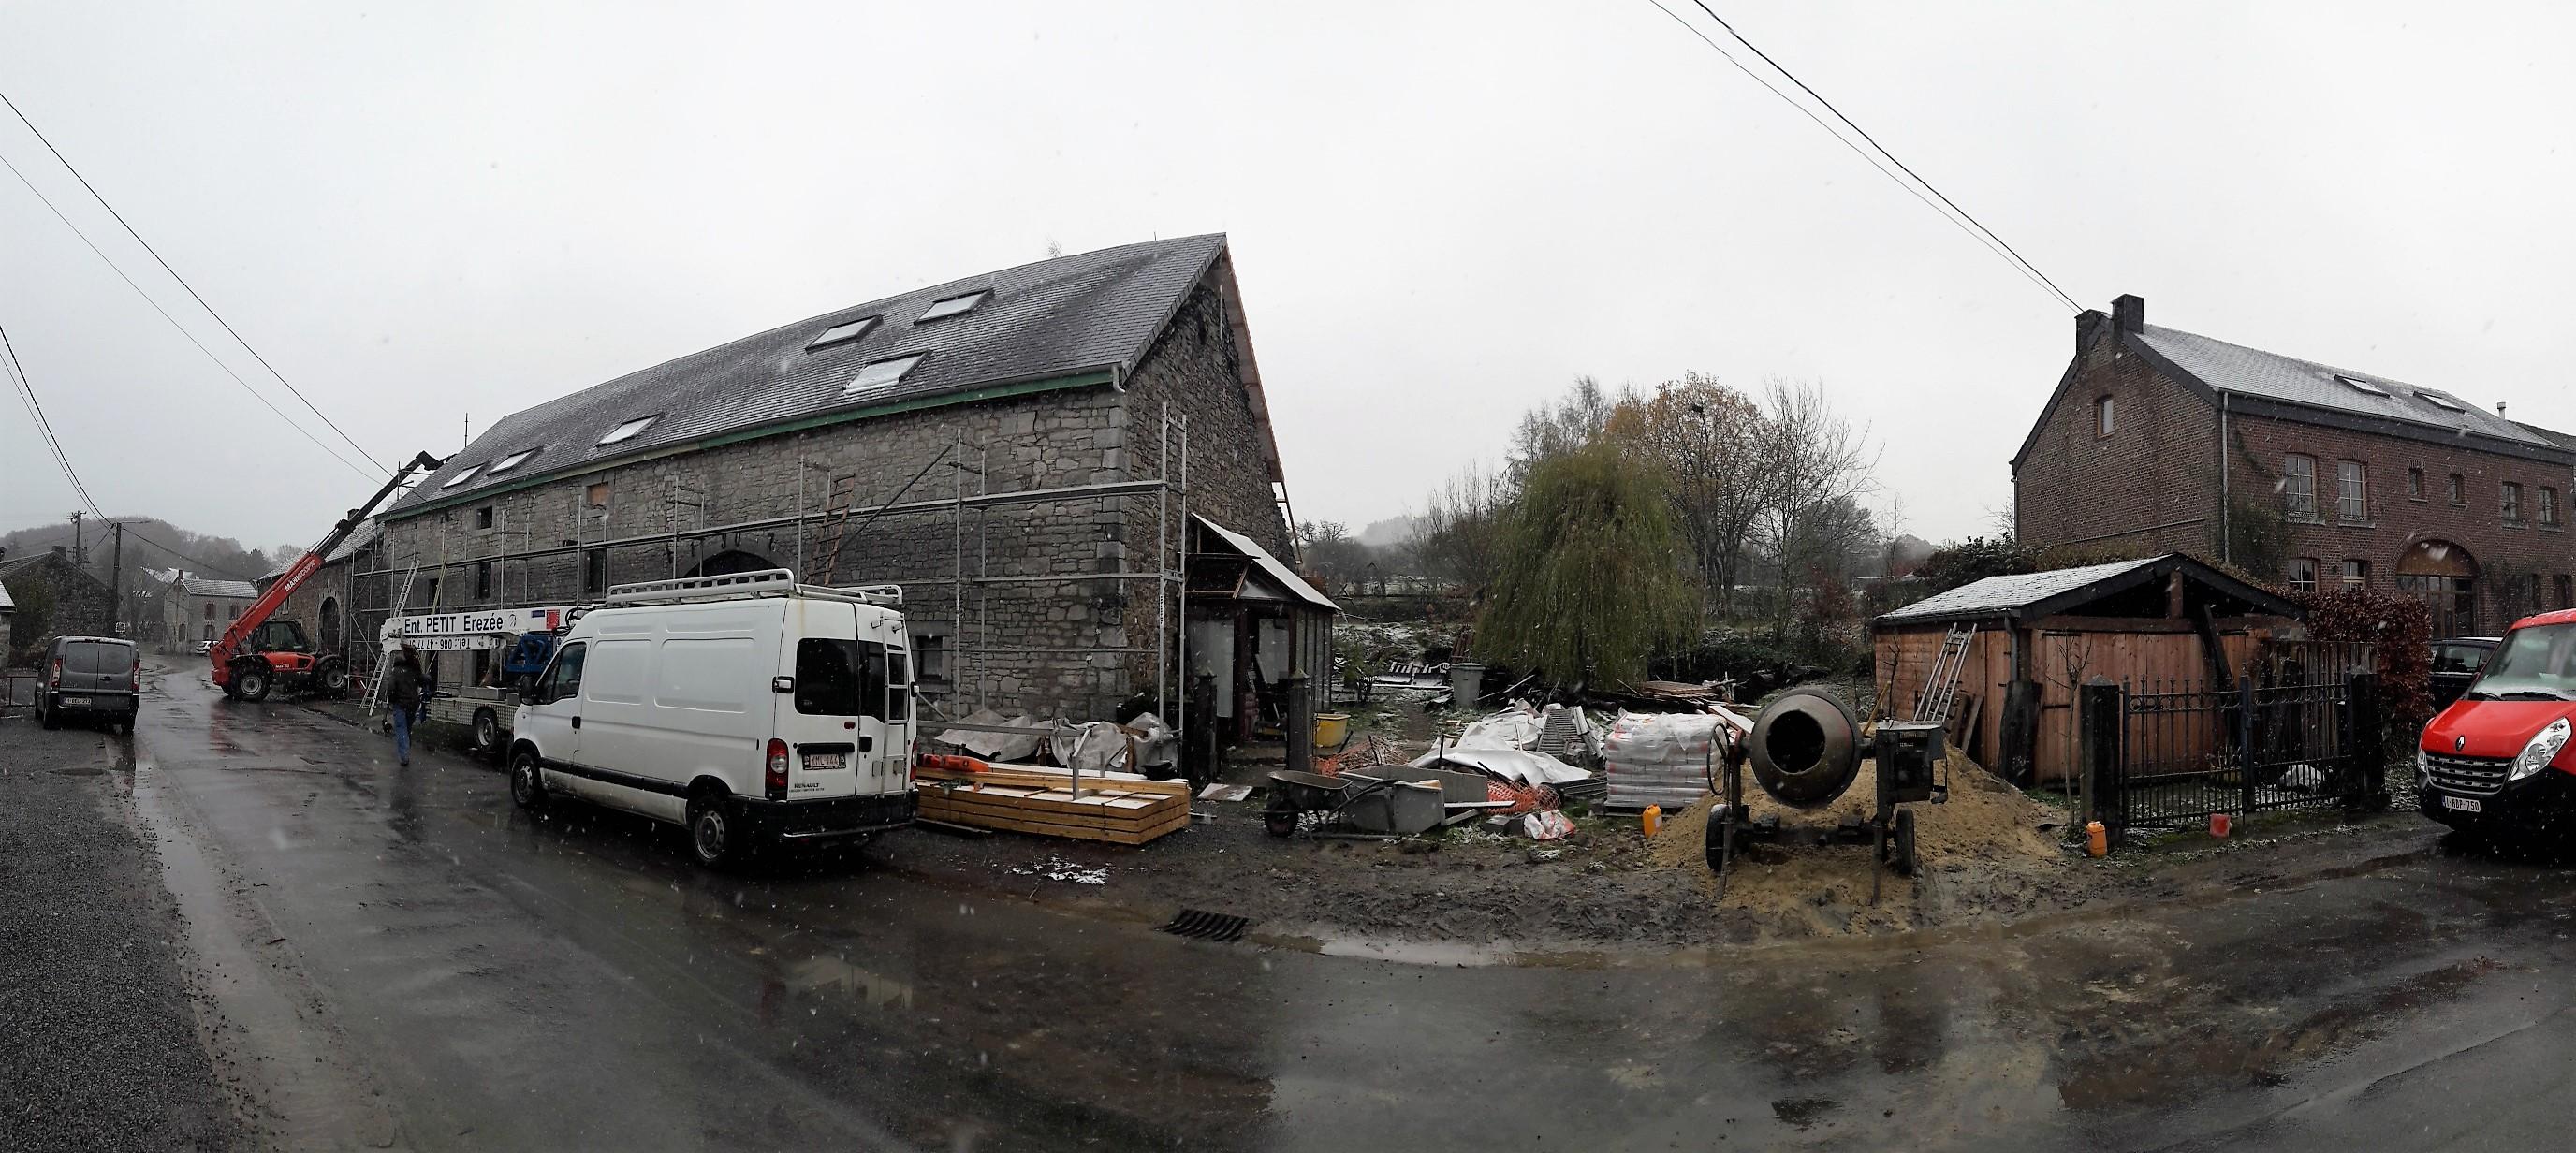 Transformation Maison du XIX Durbuy